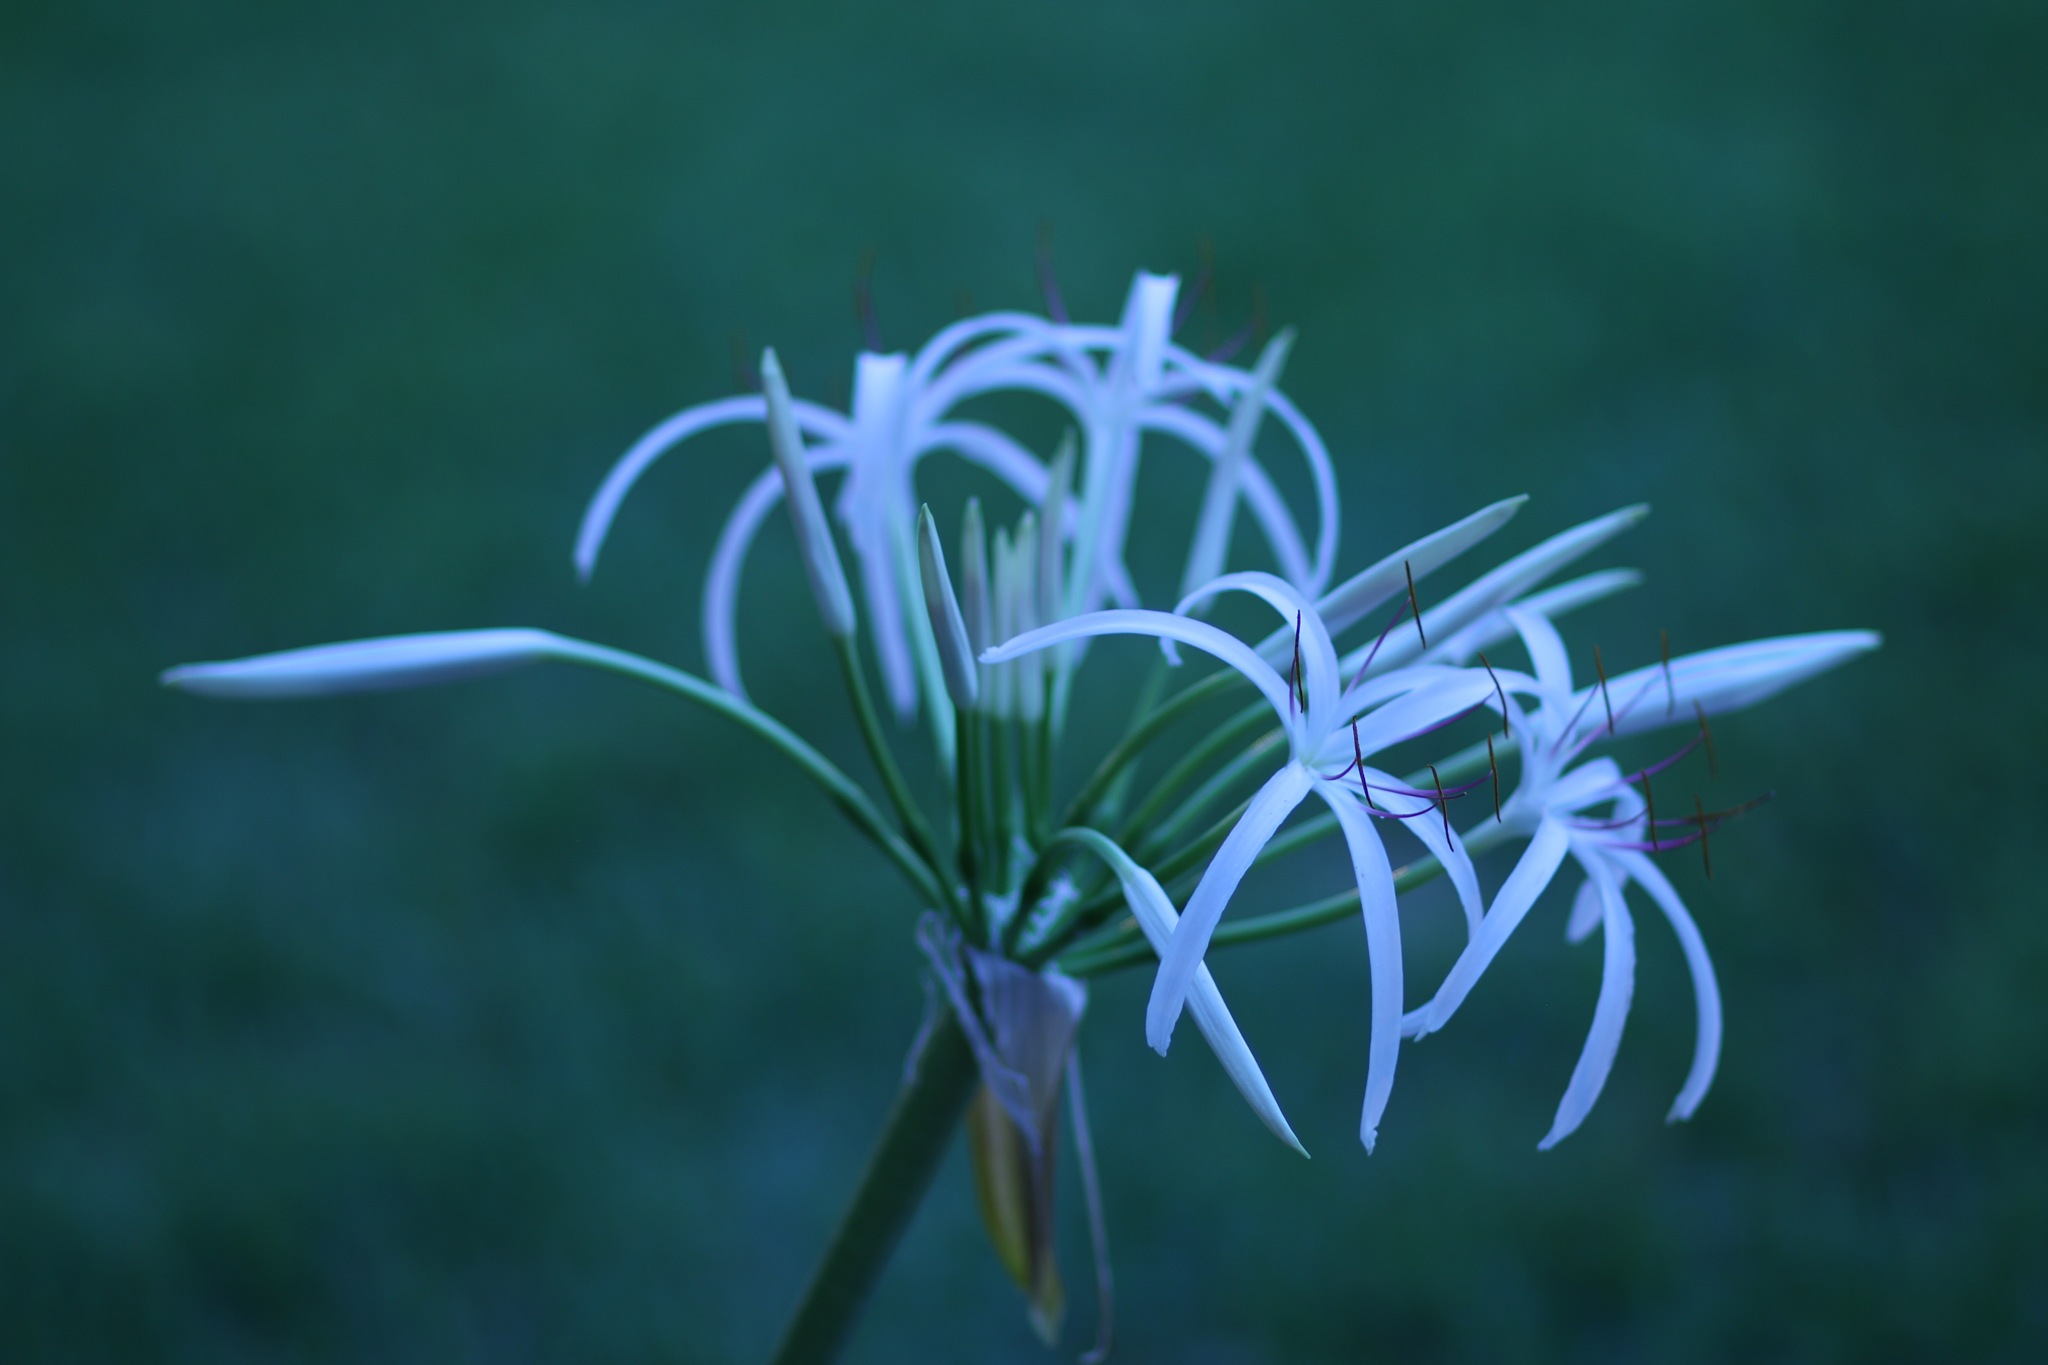 White Flower by richardrumana